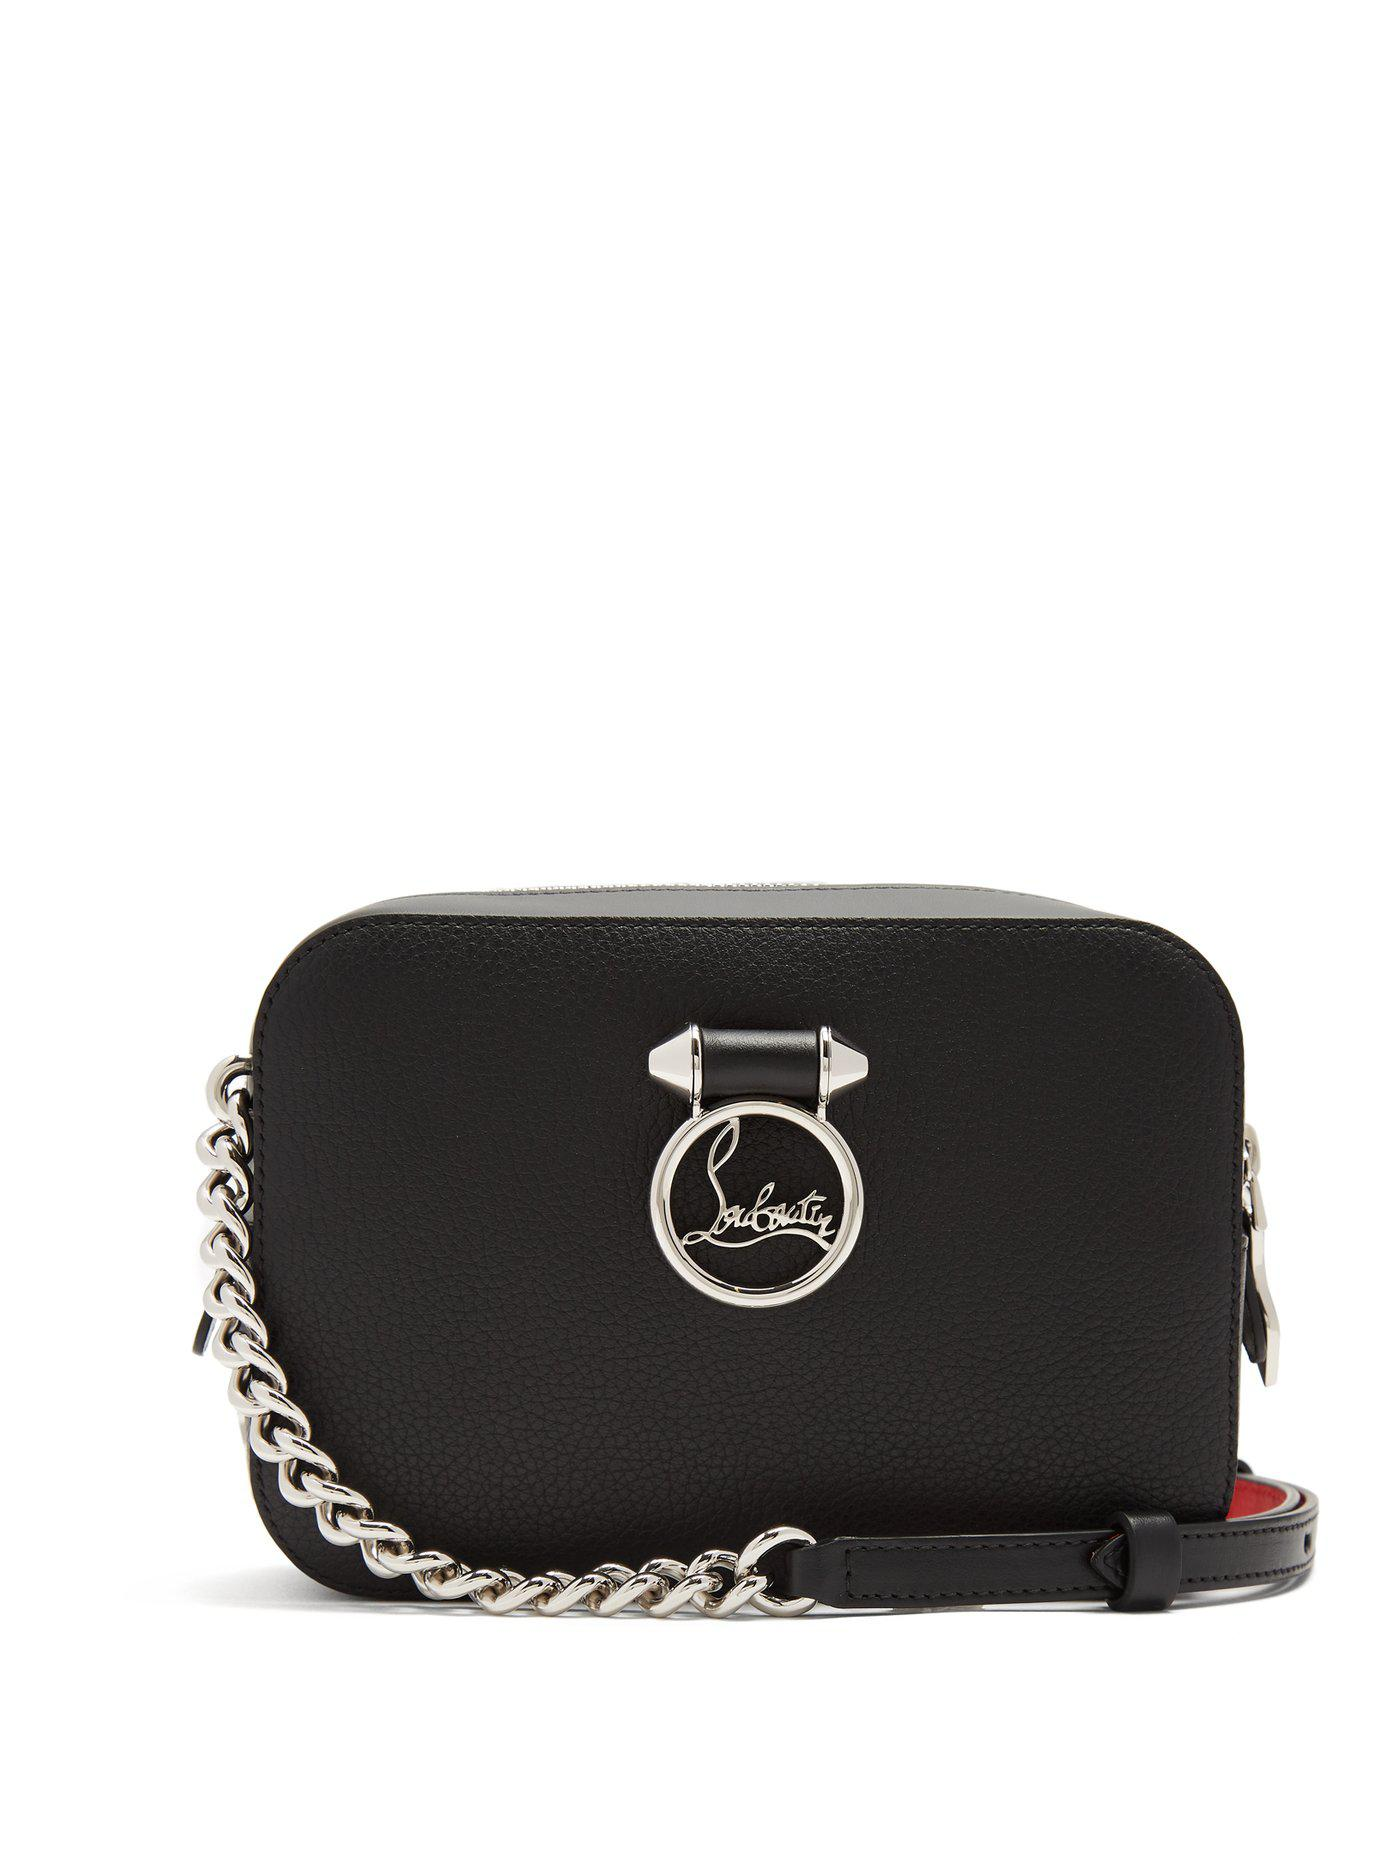 8da15314ed7 Christian Louboutin Ruby Lou Leather Cross-body Bag in Black - Lyst